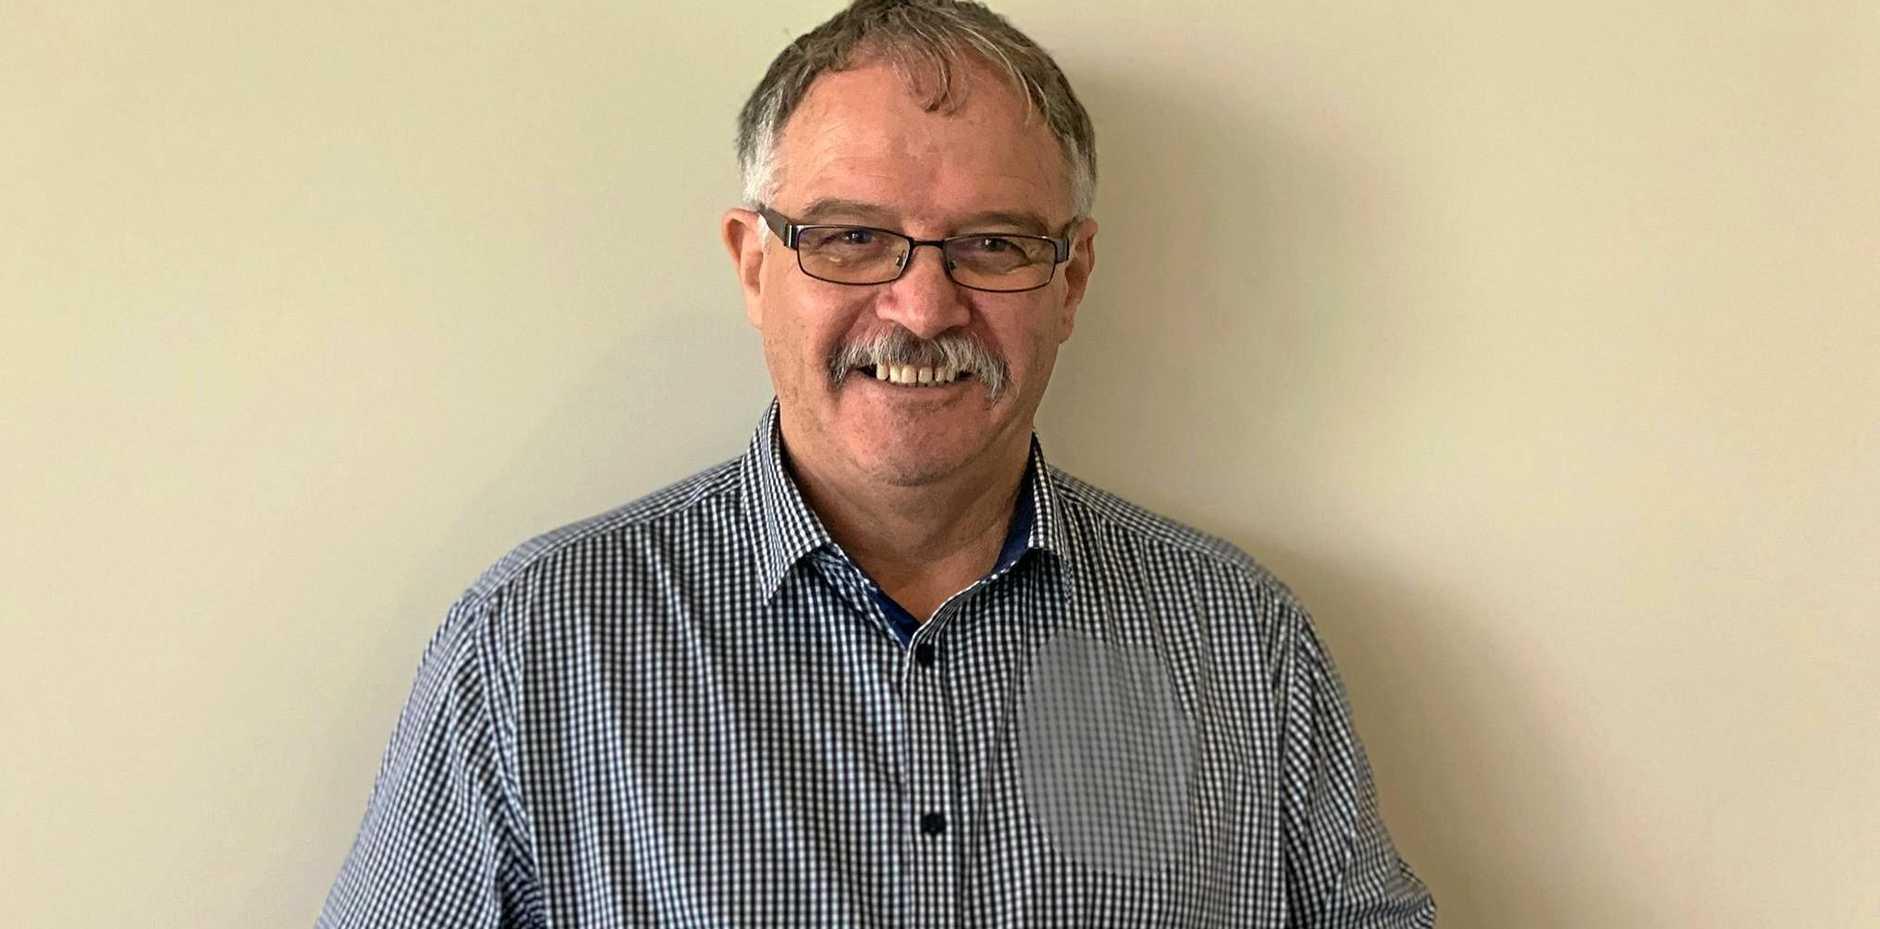 Australian distributor of the Icebreaker product Brian Crawford.